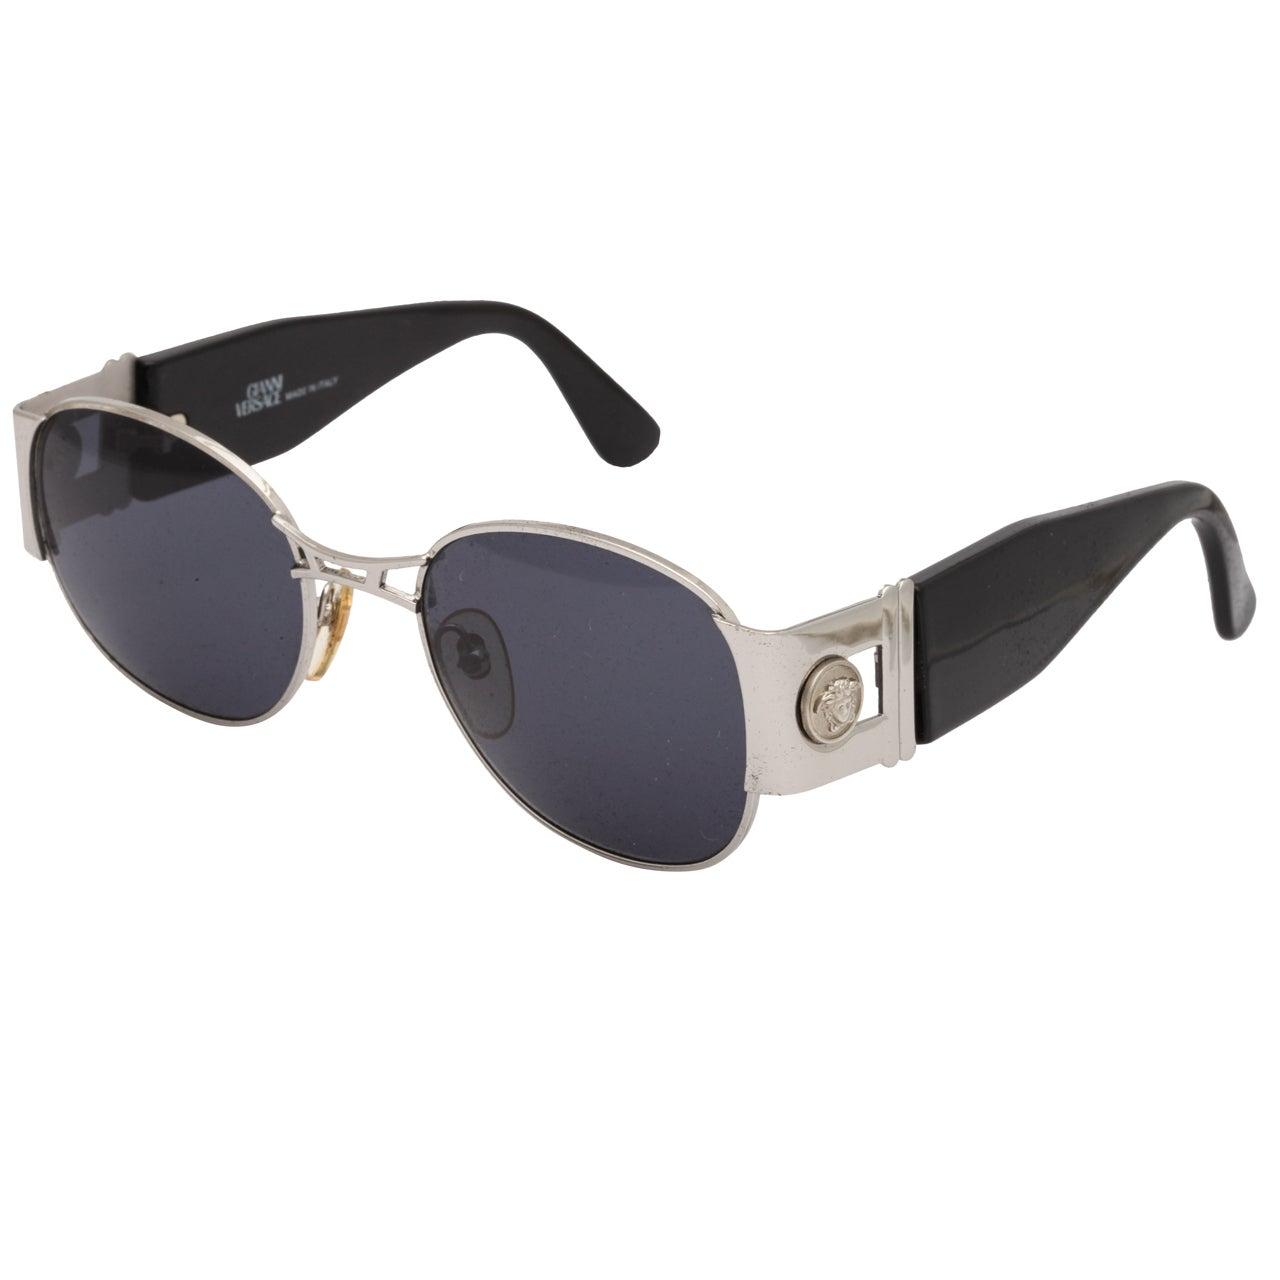 Gianni Versace Sunglasses Mod S67 Col 26m At 1stdibs